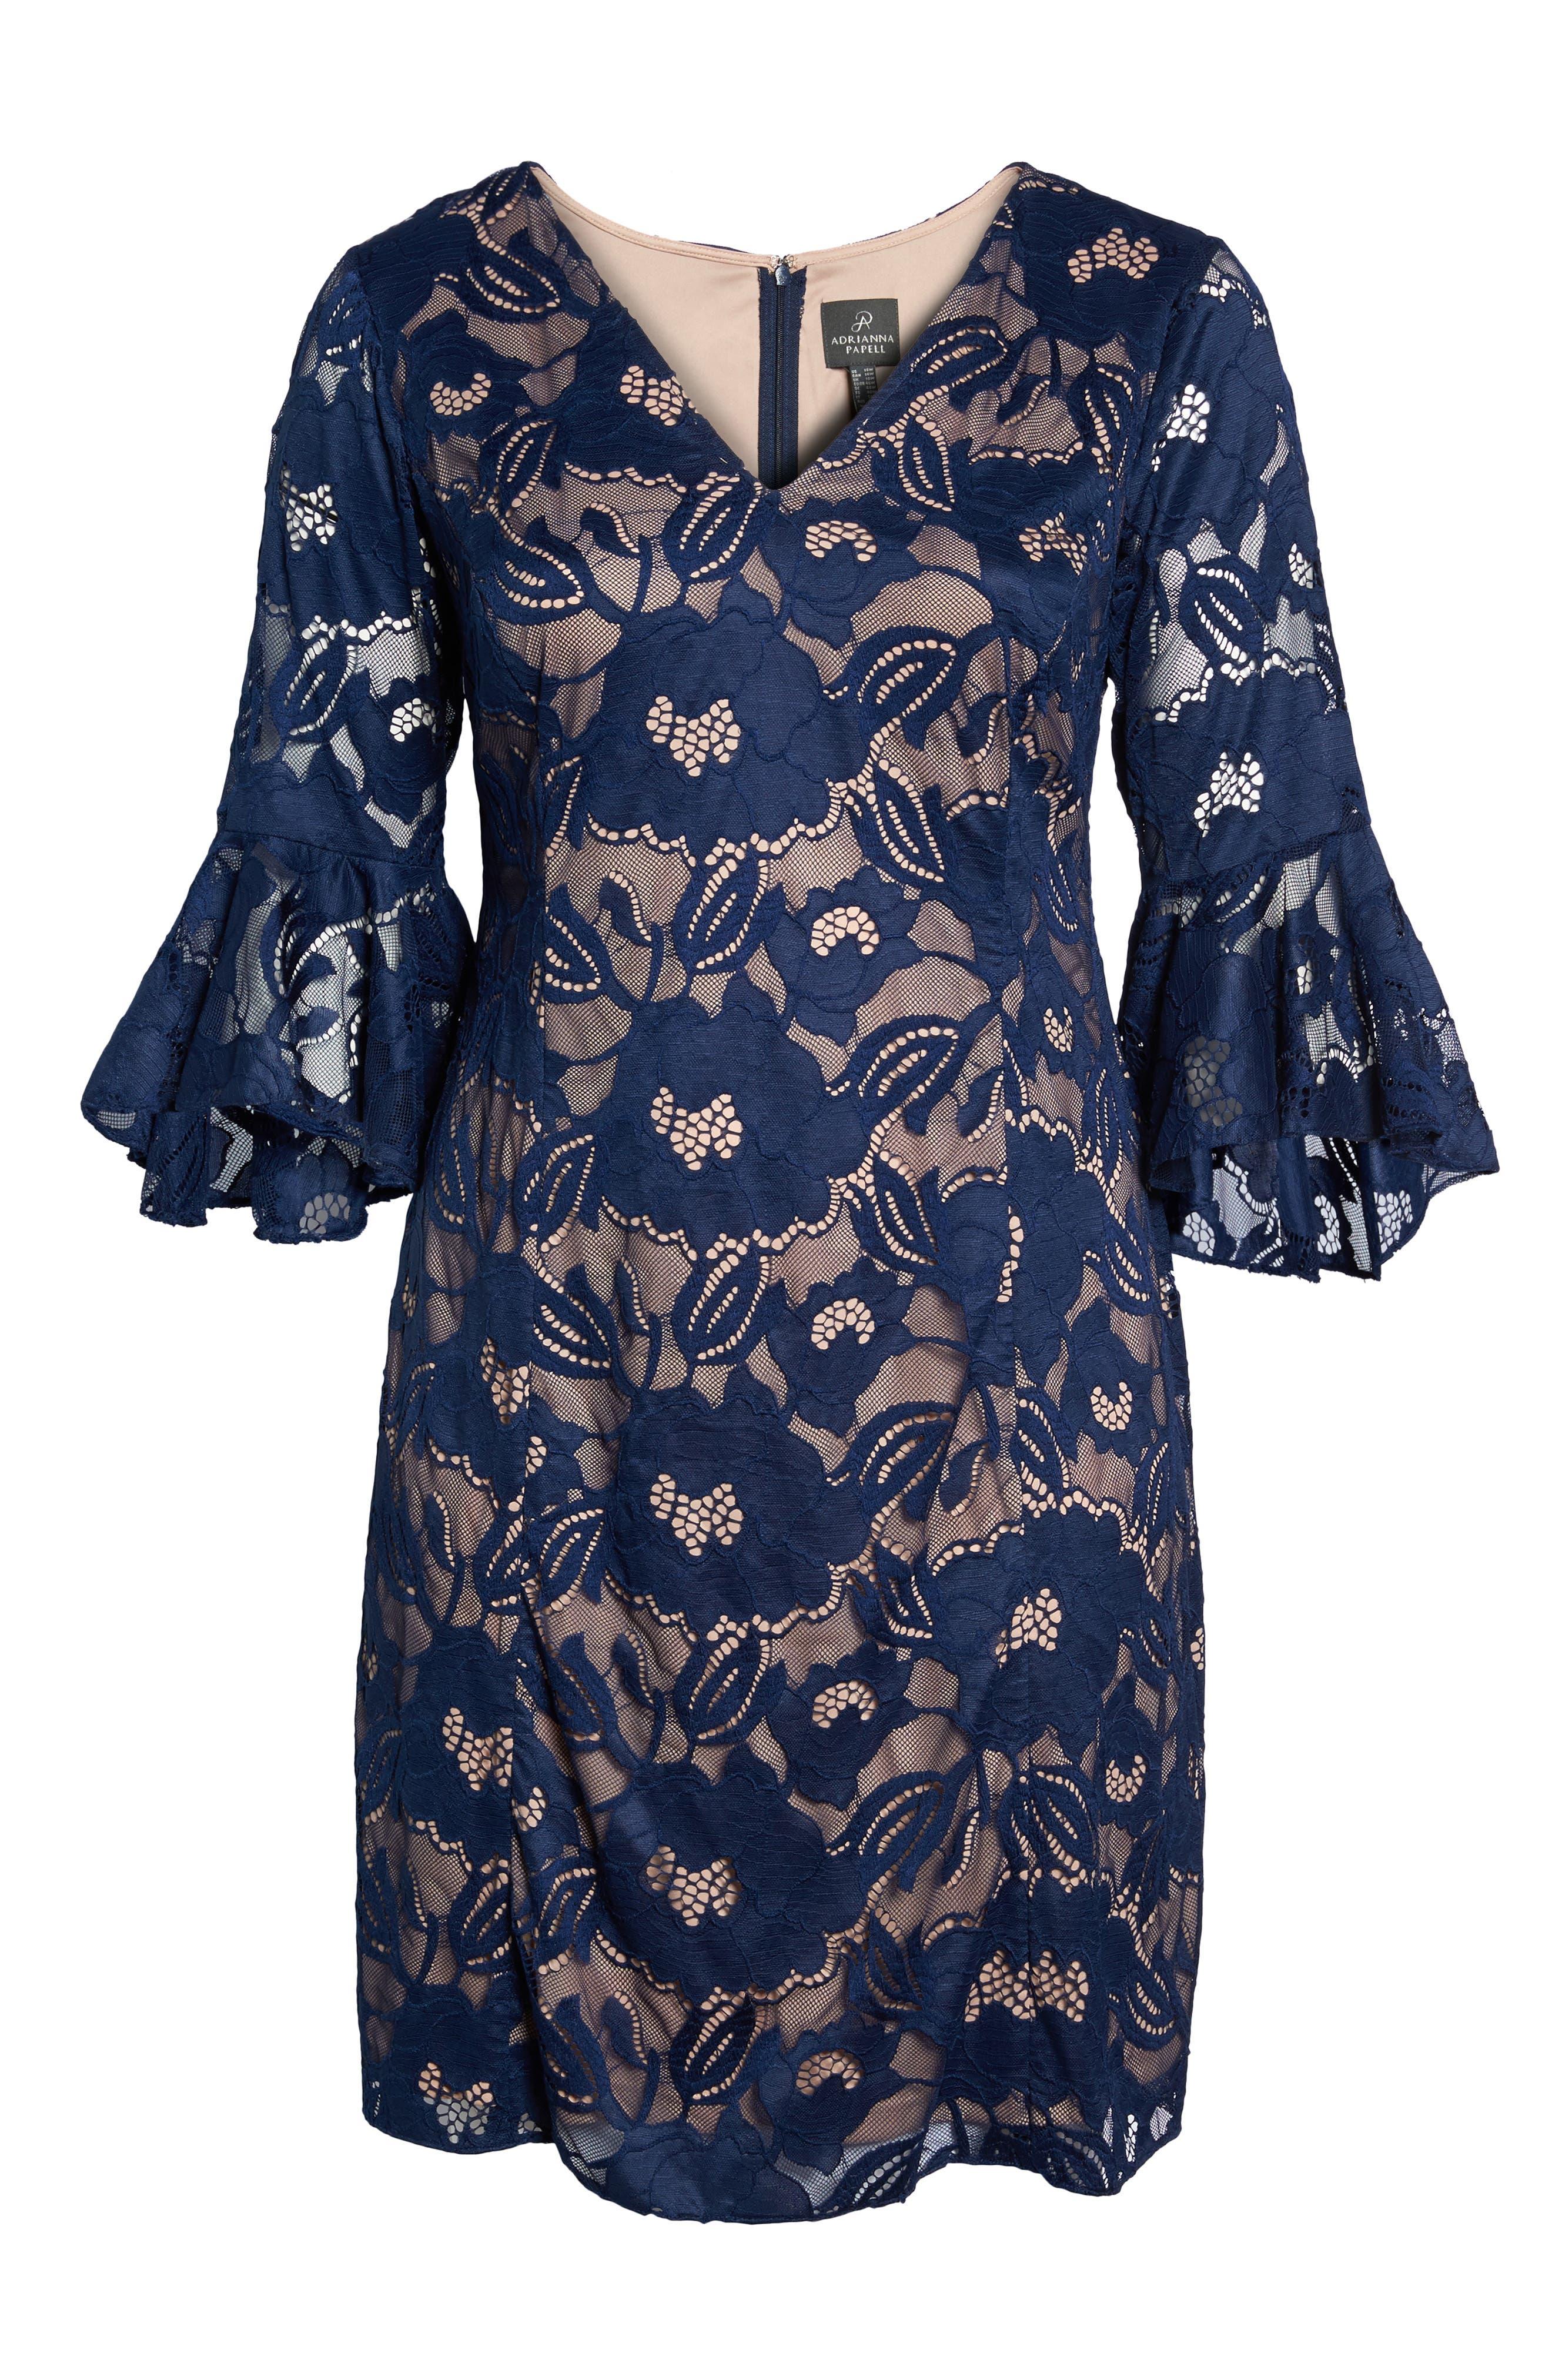 Ruffle Sleeve Lace Dress,                             Alternate thumbnail 6, color,                             412